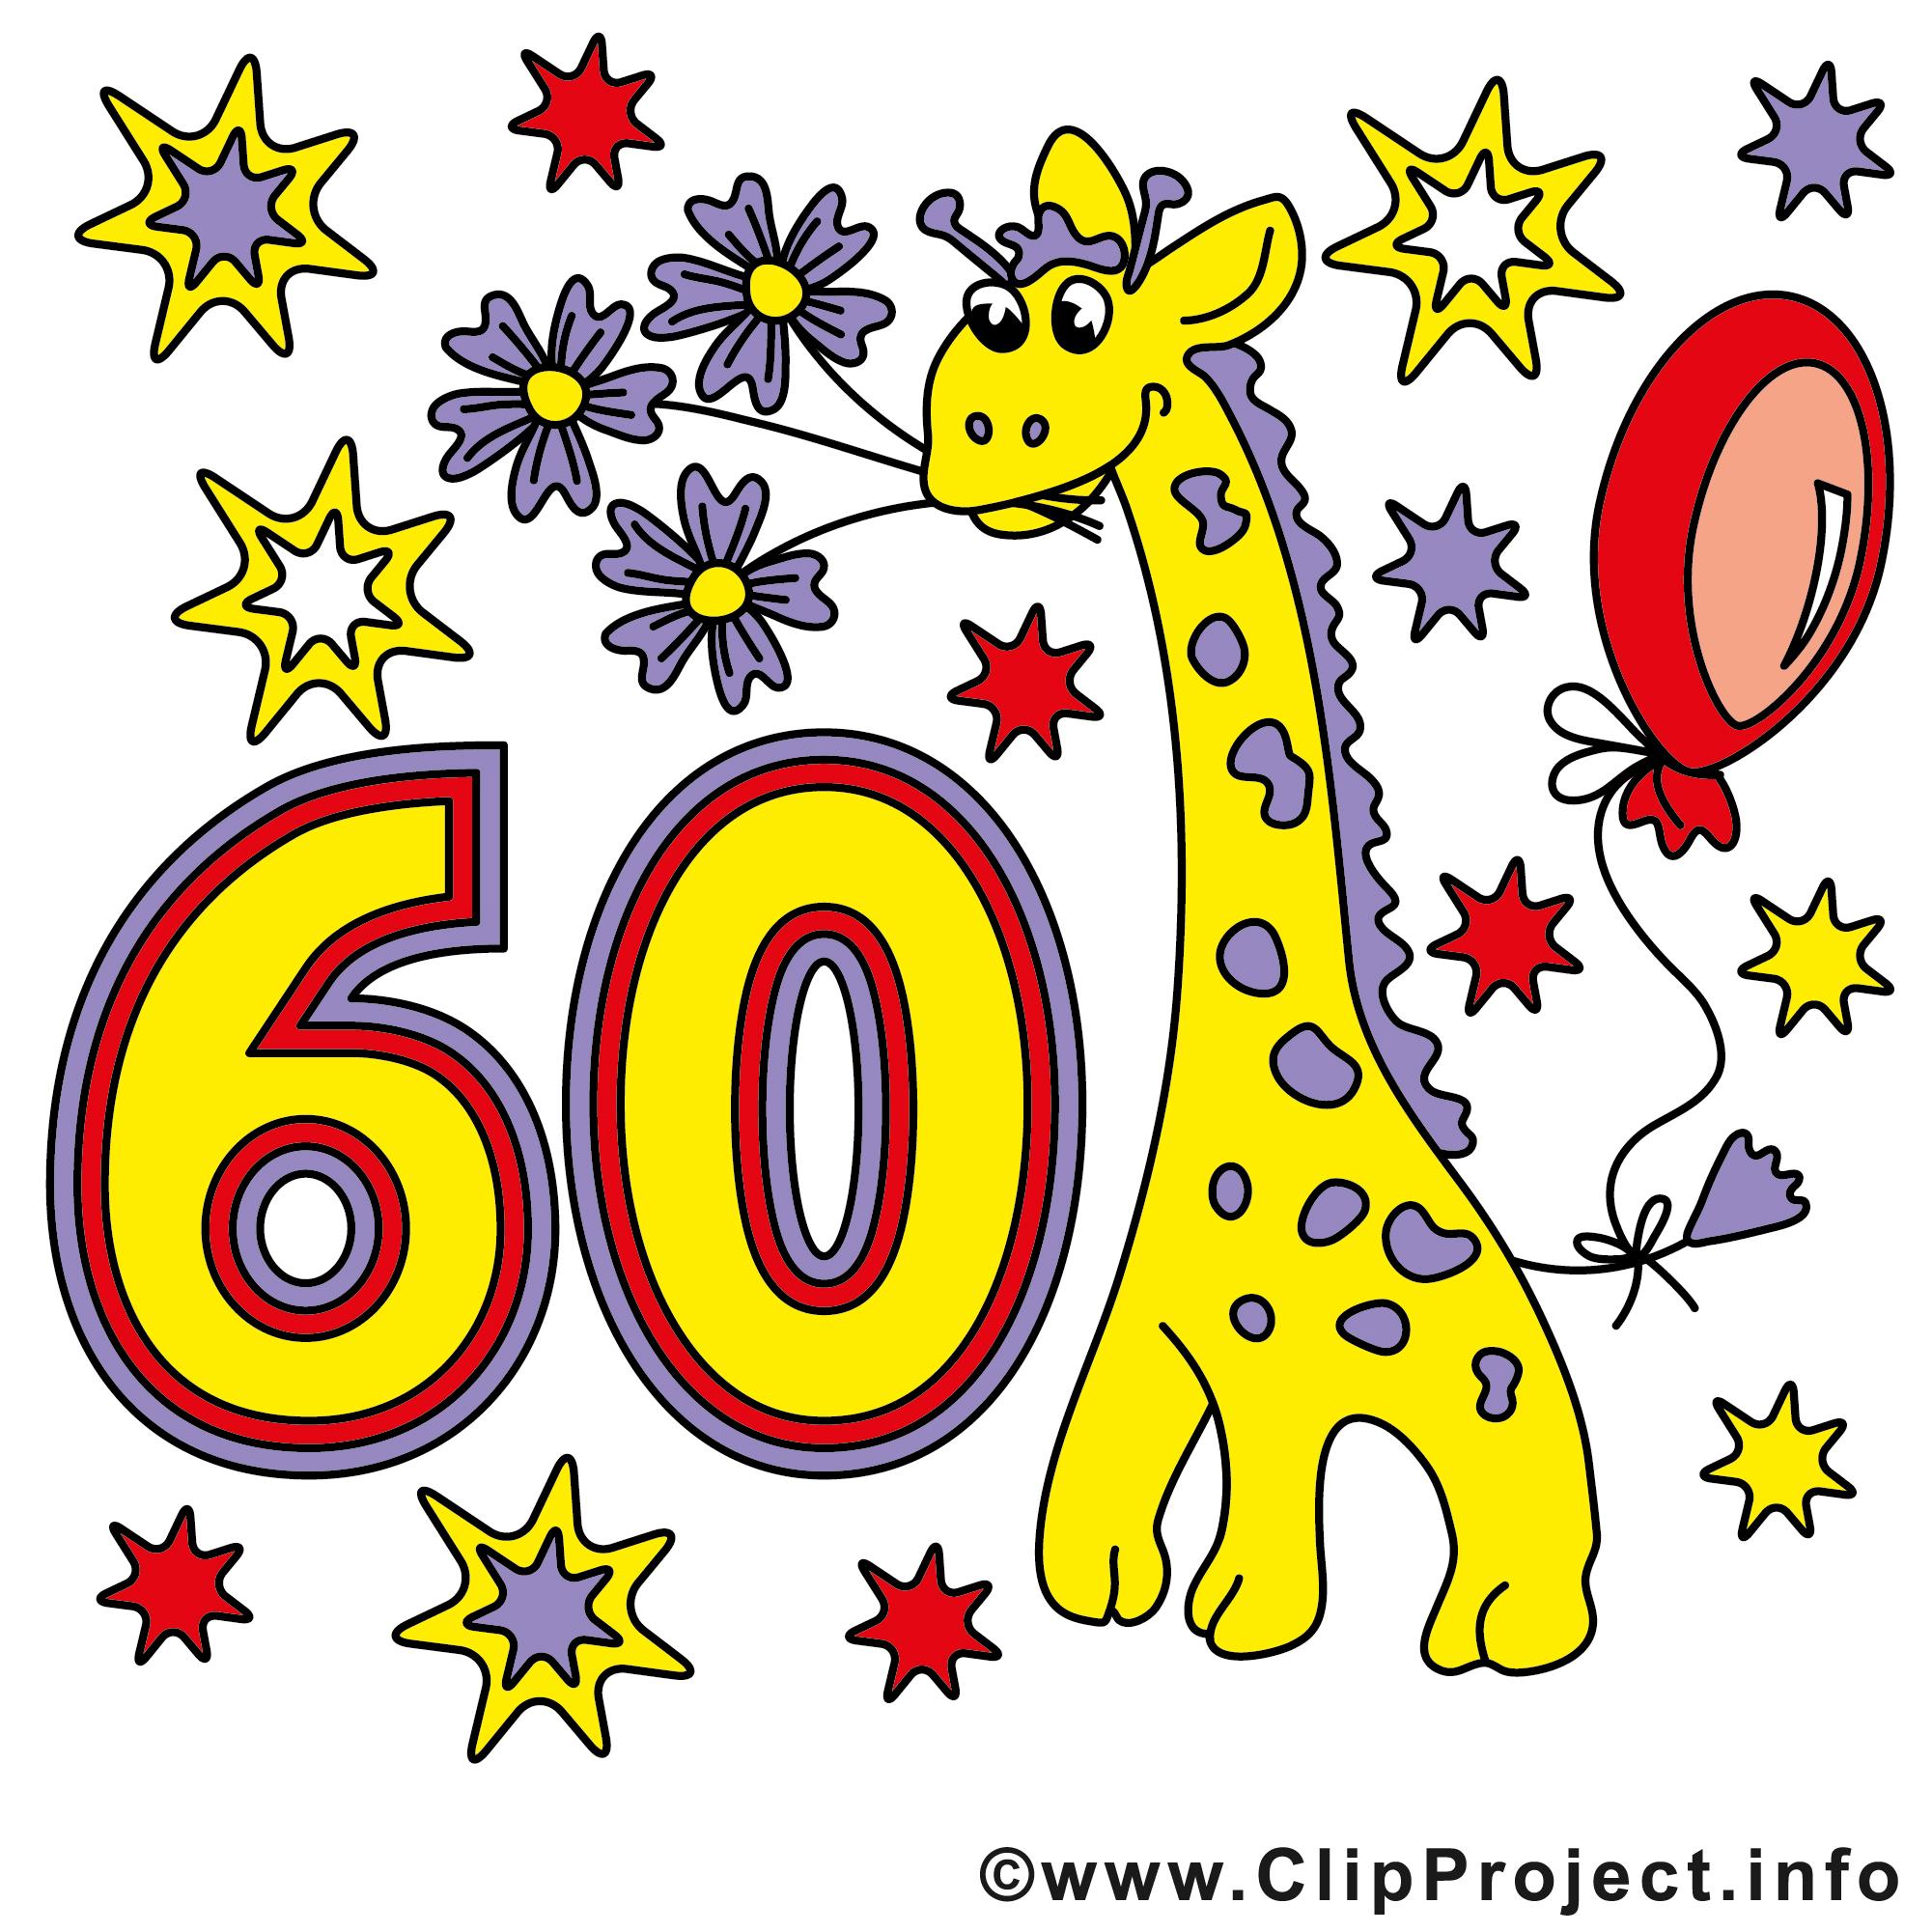 Clipart einladung 60 geburtstag vector freeuse library Cliparts zum 60 geburtstag - ClipartFest vector freeuse library